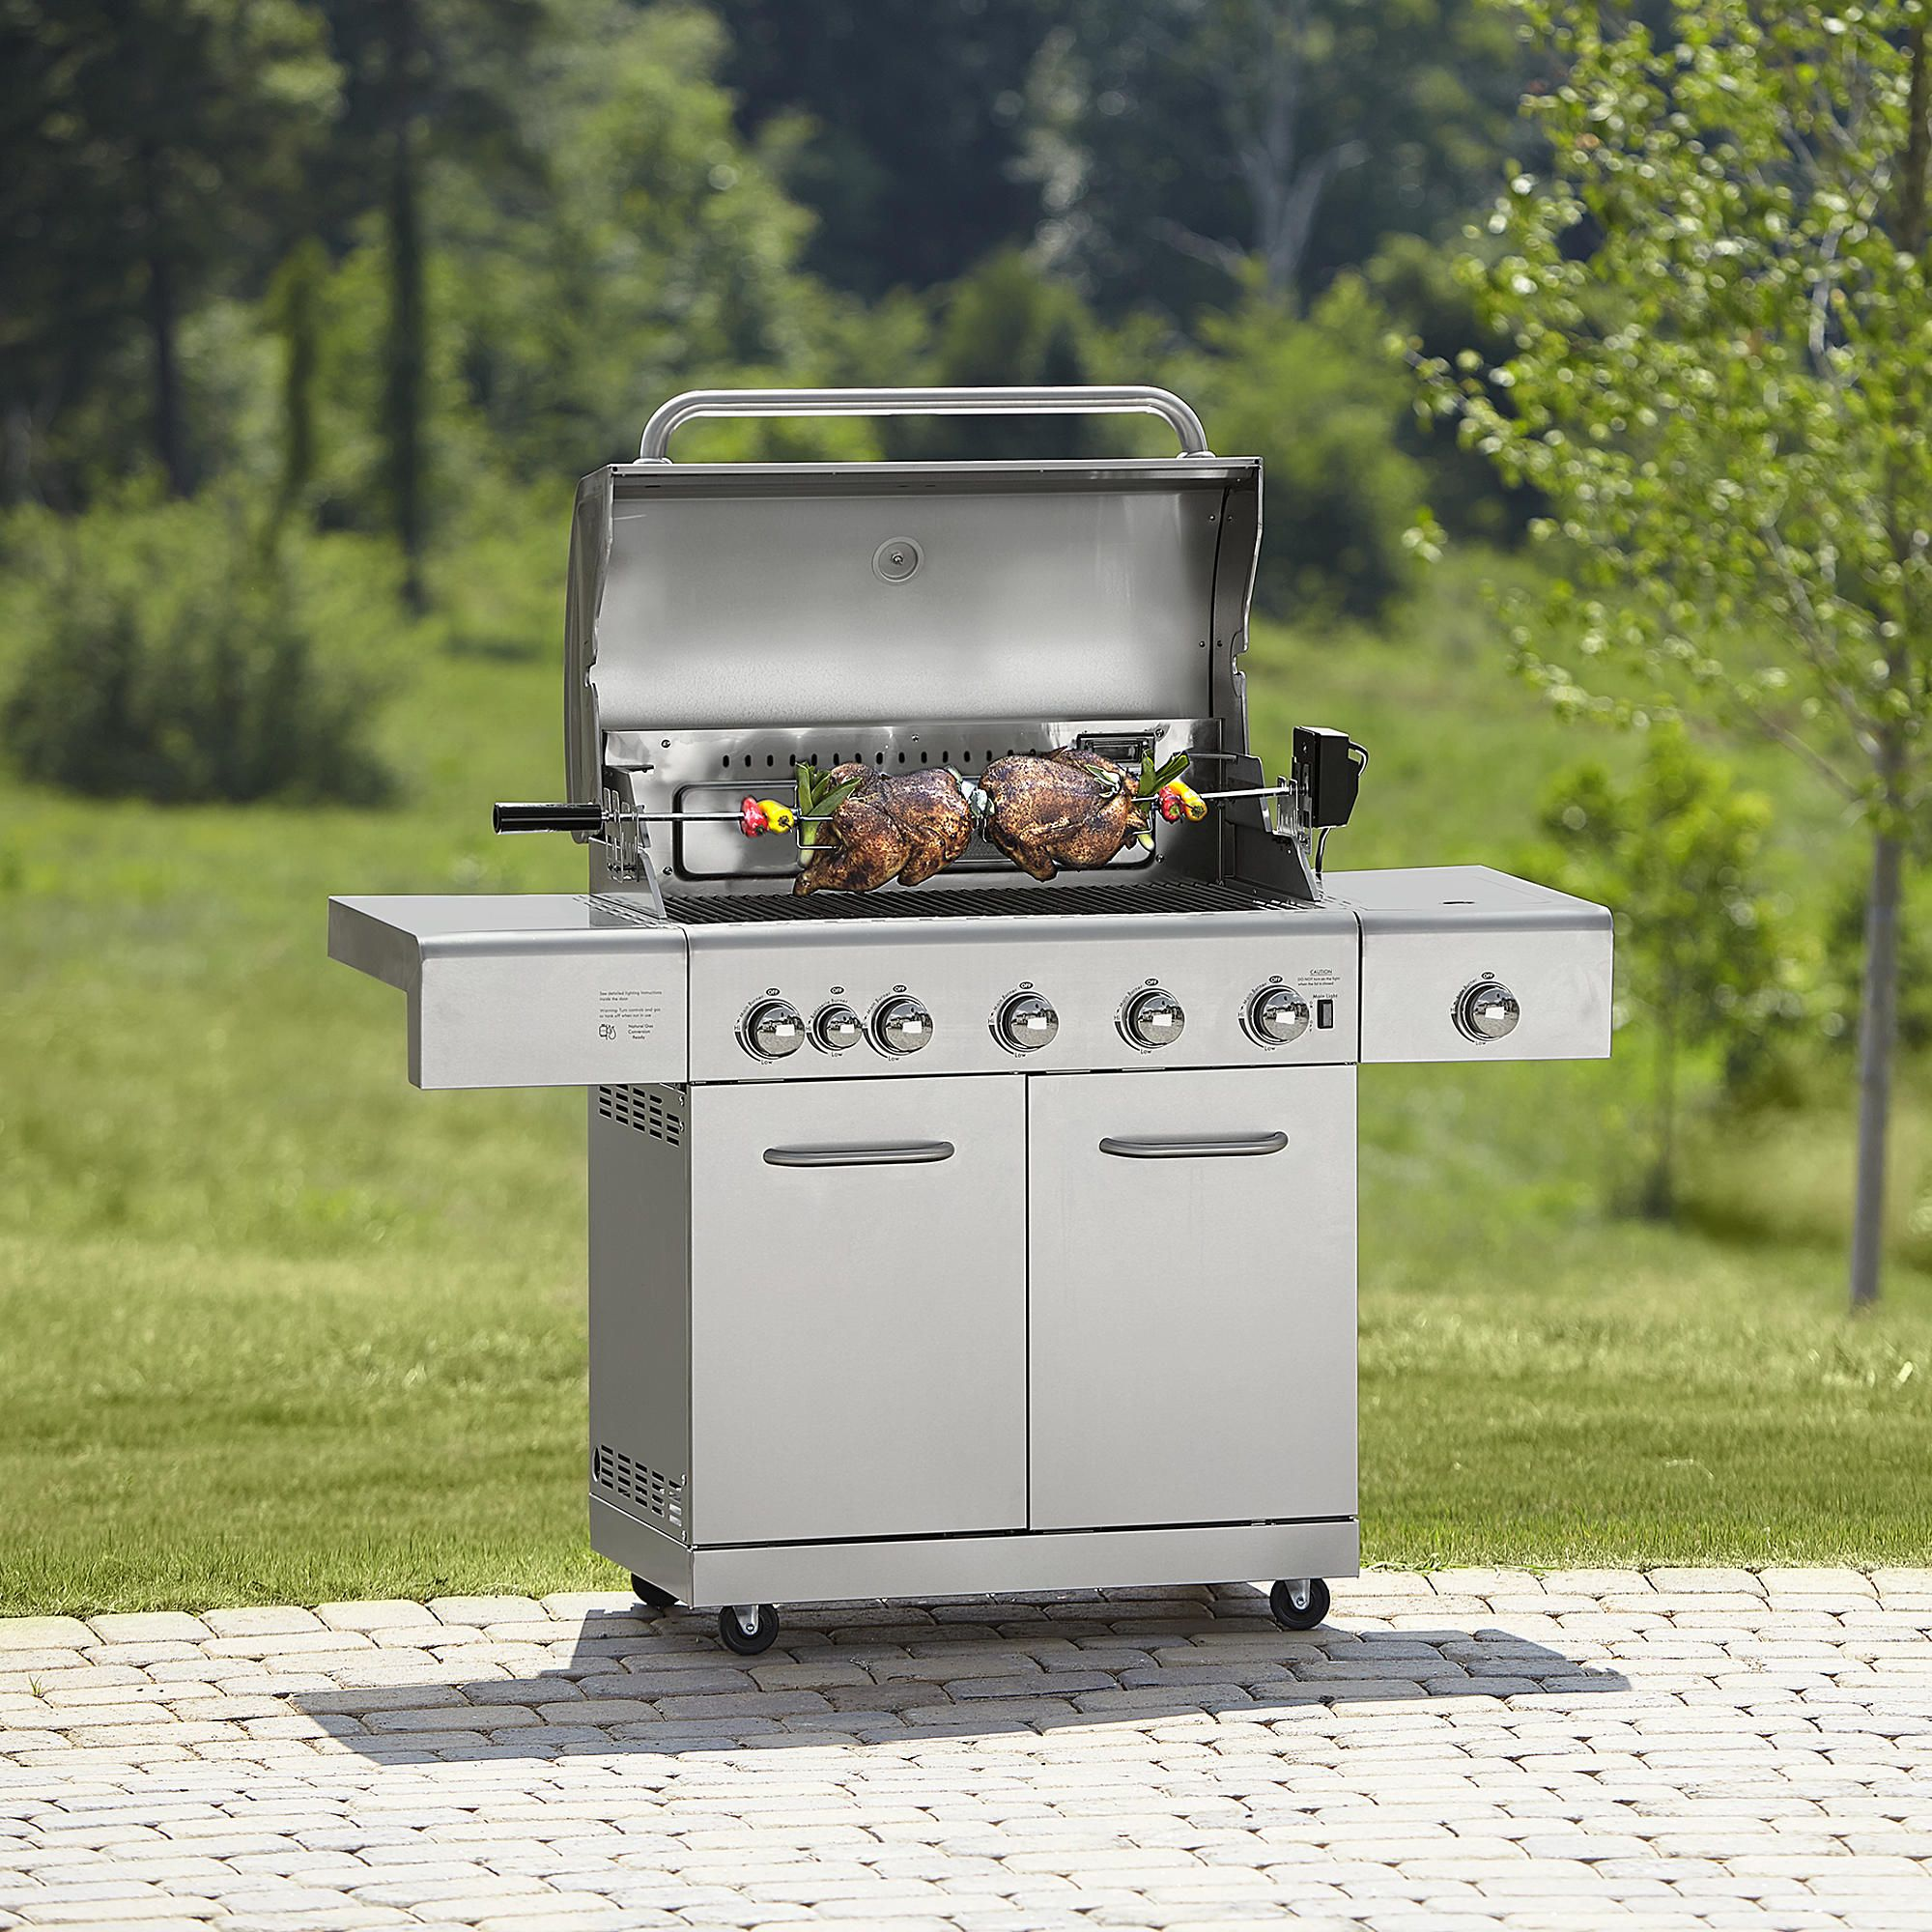 www.sears.com/kenmore-5-burner-stainless-steel-gas-grill ...